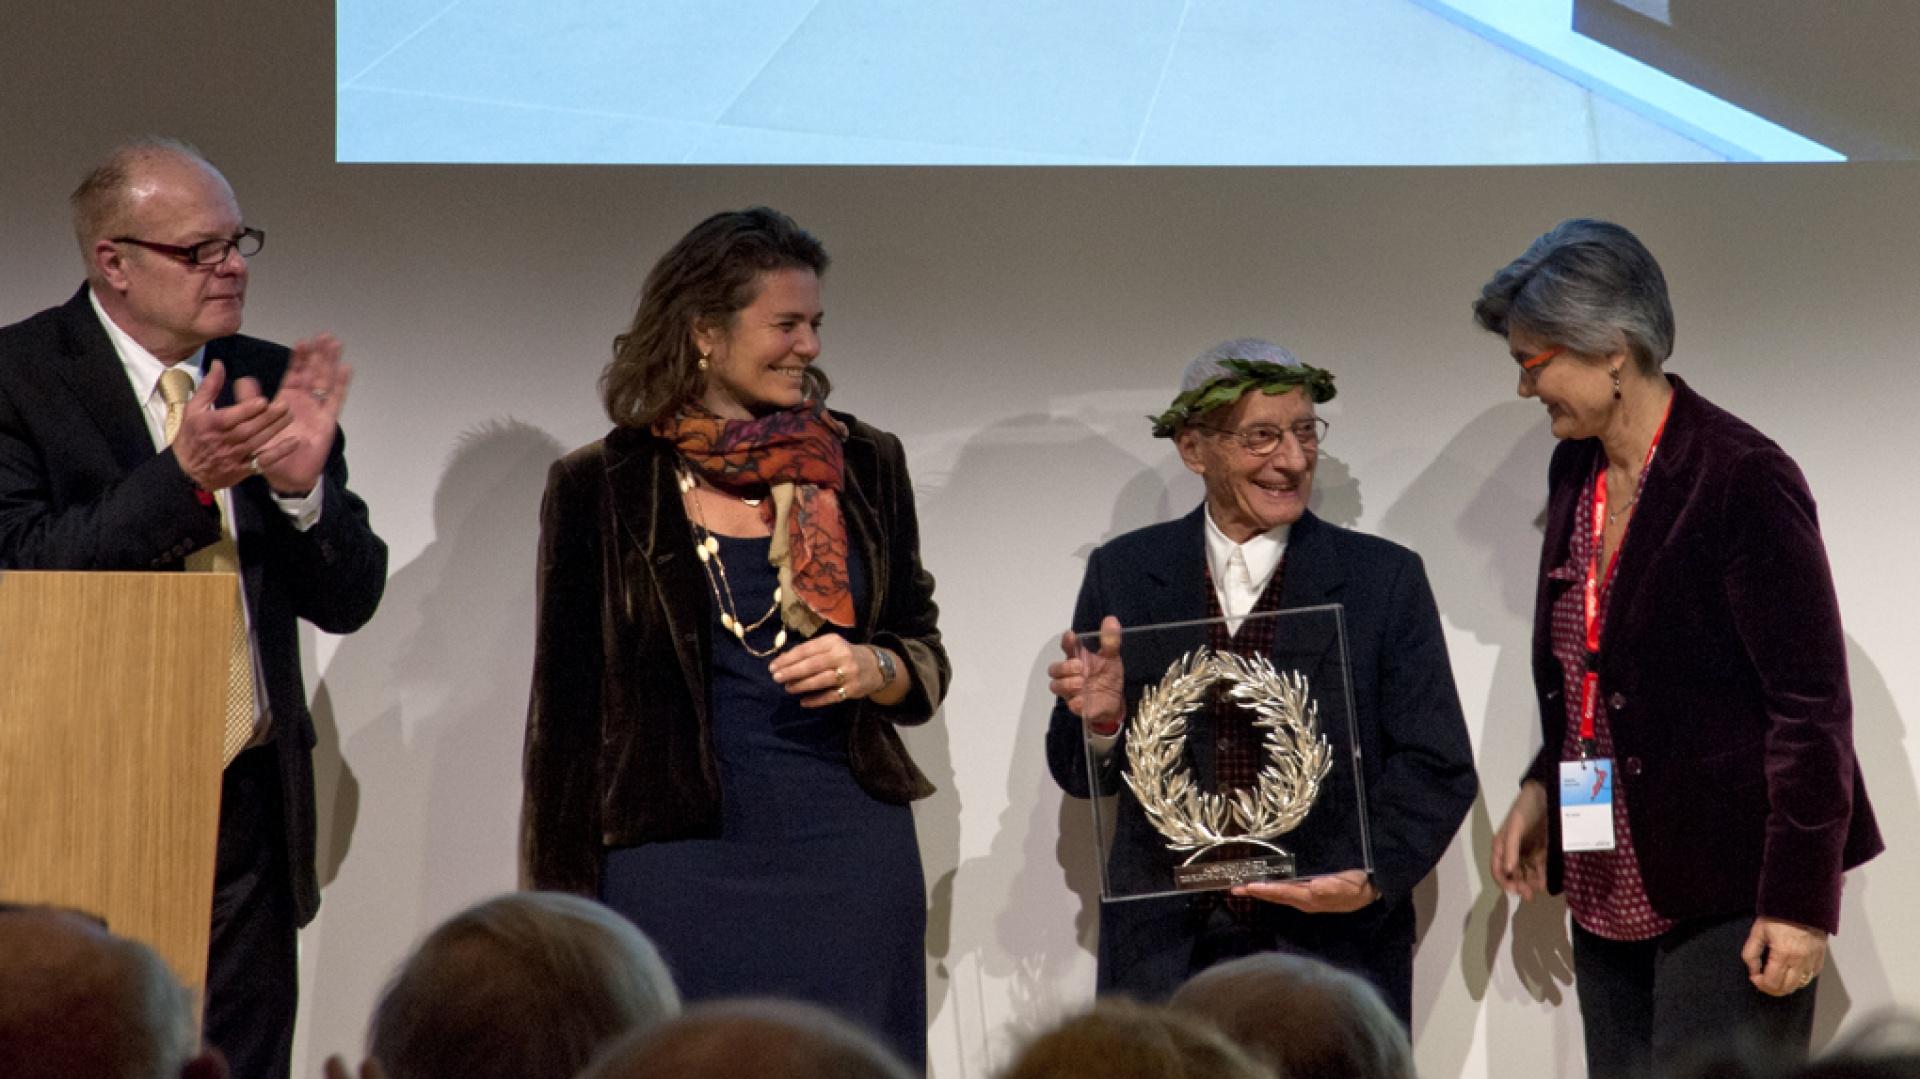 Alessandro Mendini laureatem The European Prize for Architecture. Fot. Clara Buoncristiani